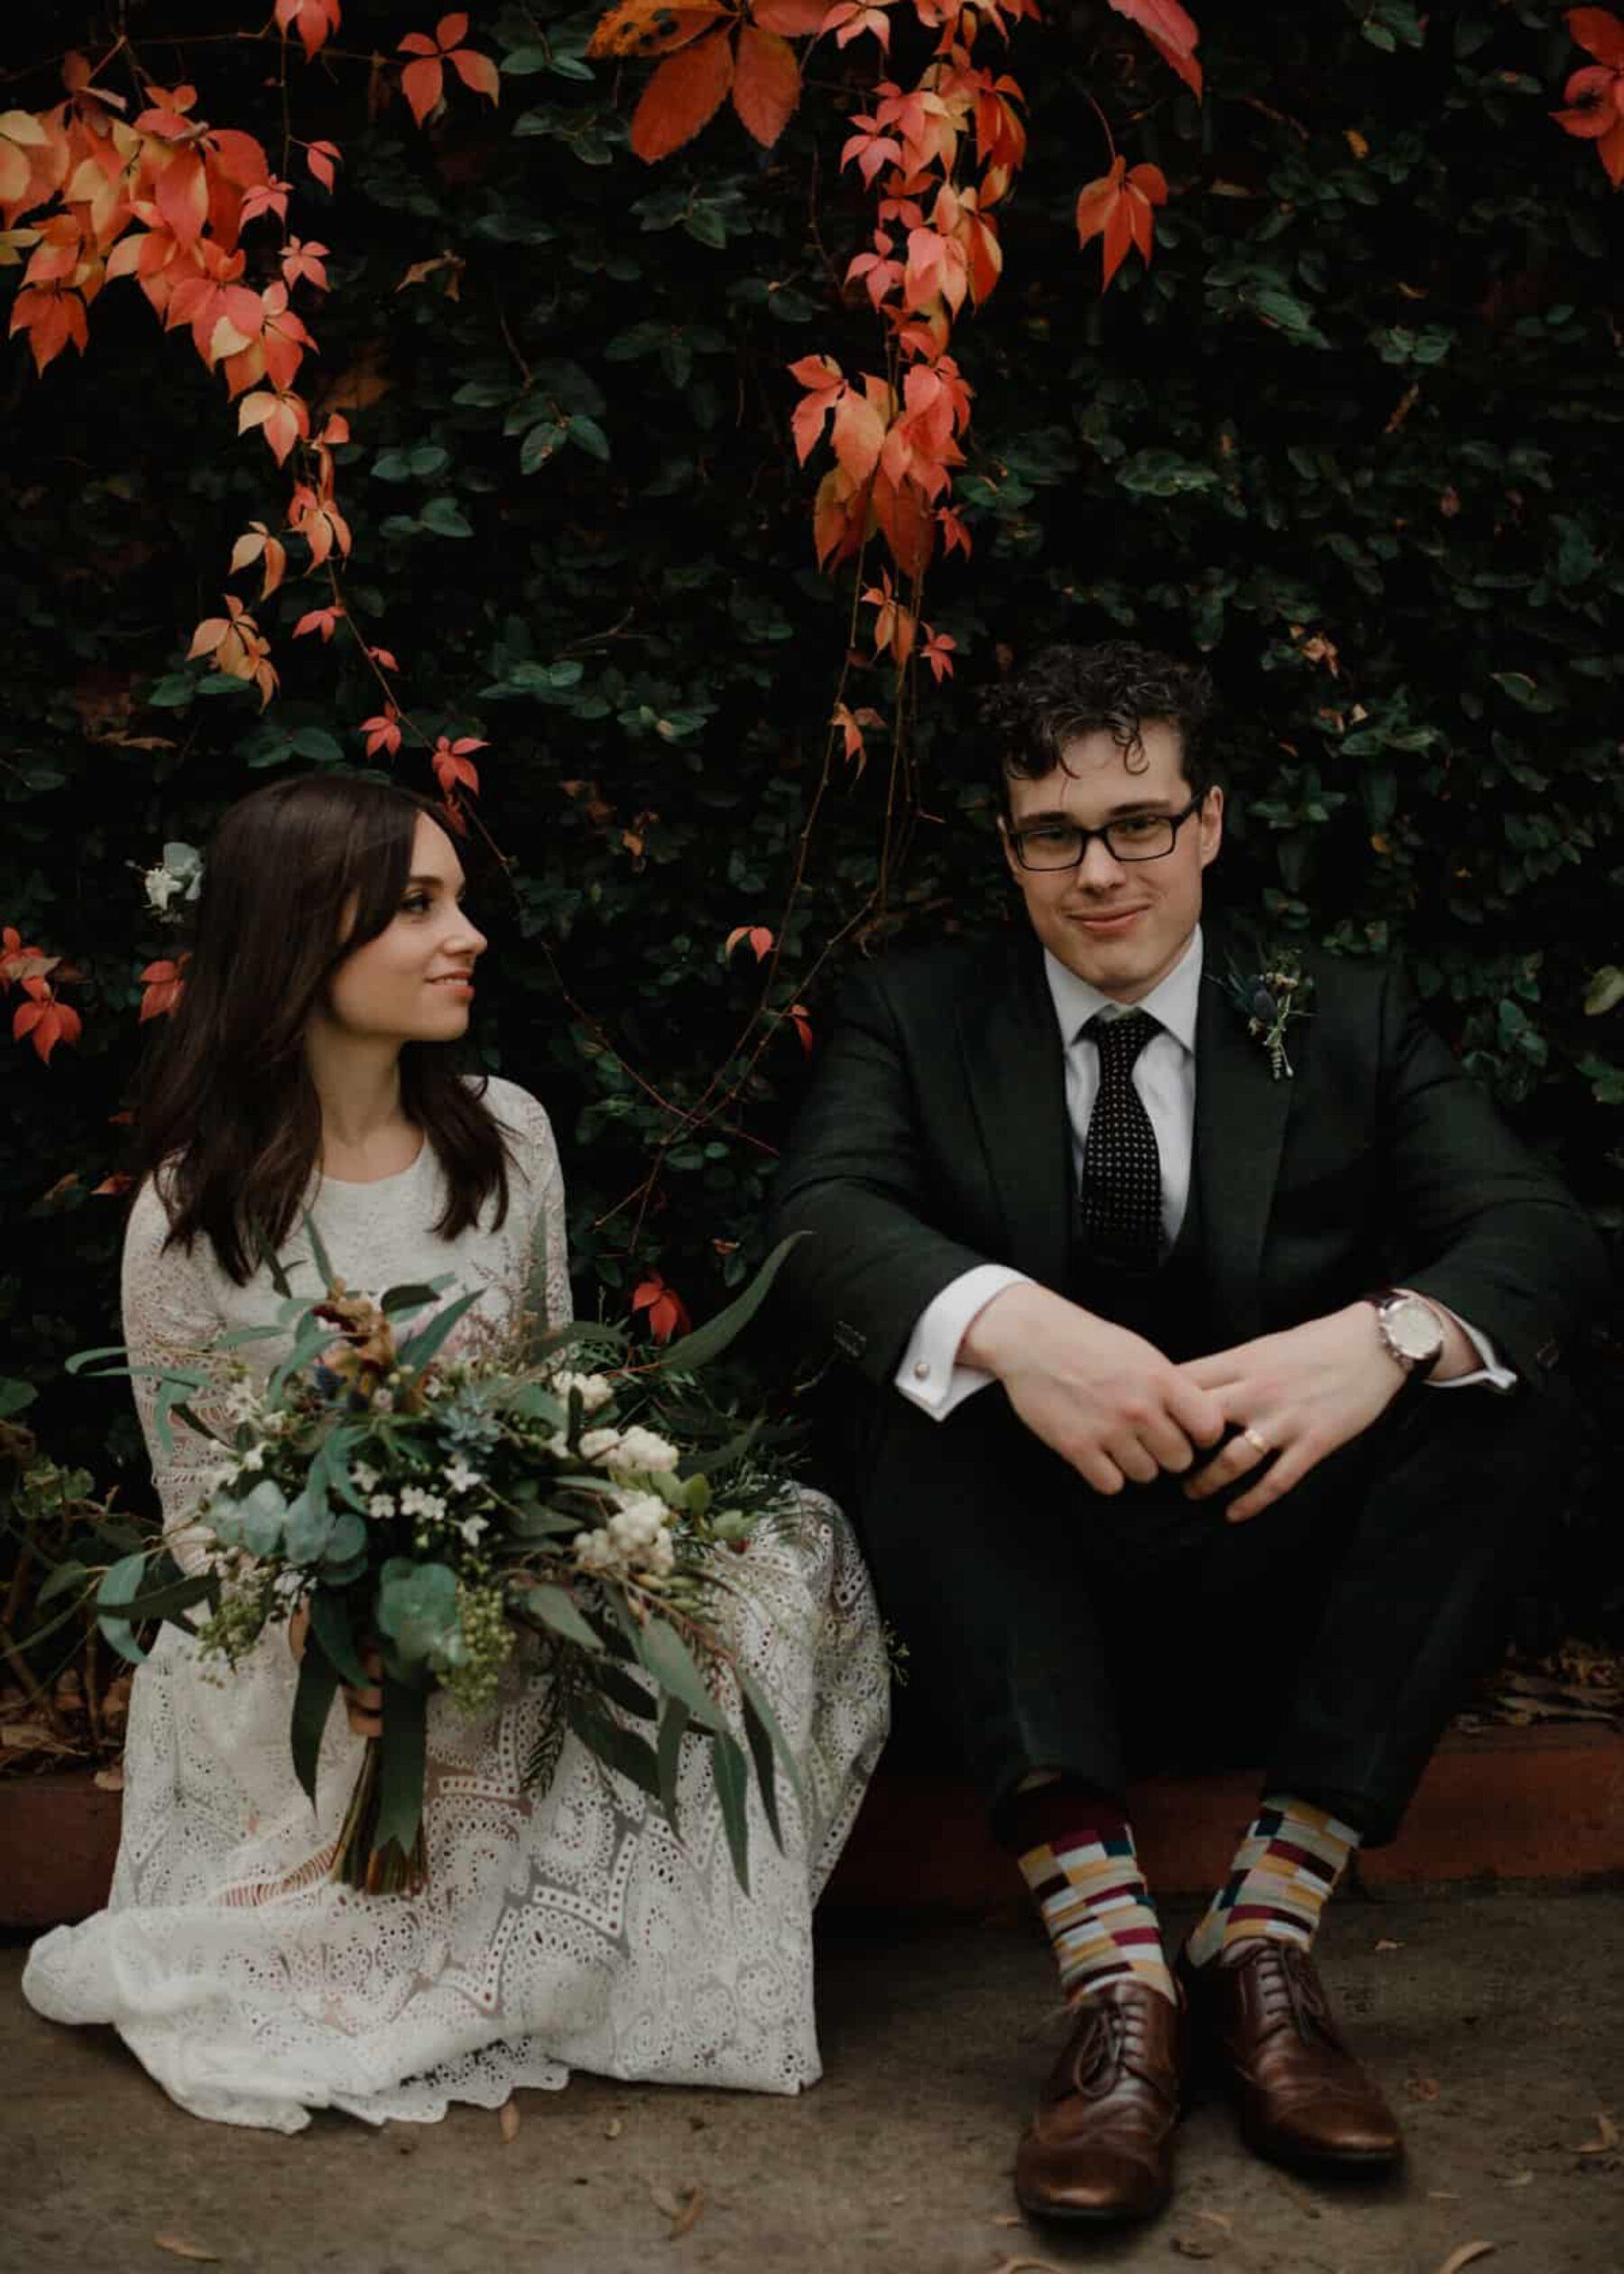 Relaxed pub wedding at The Fitzroy Pinnacle - Matt Godkin Photography